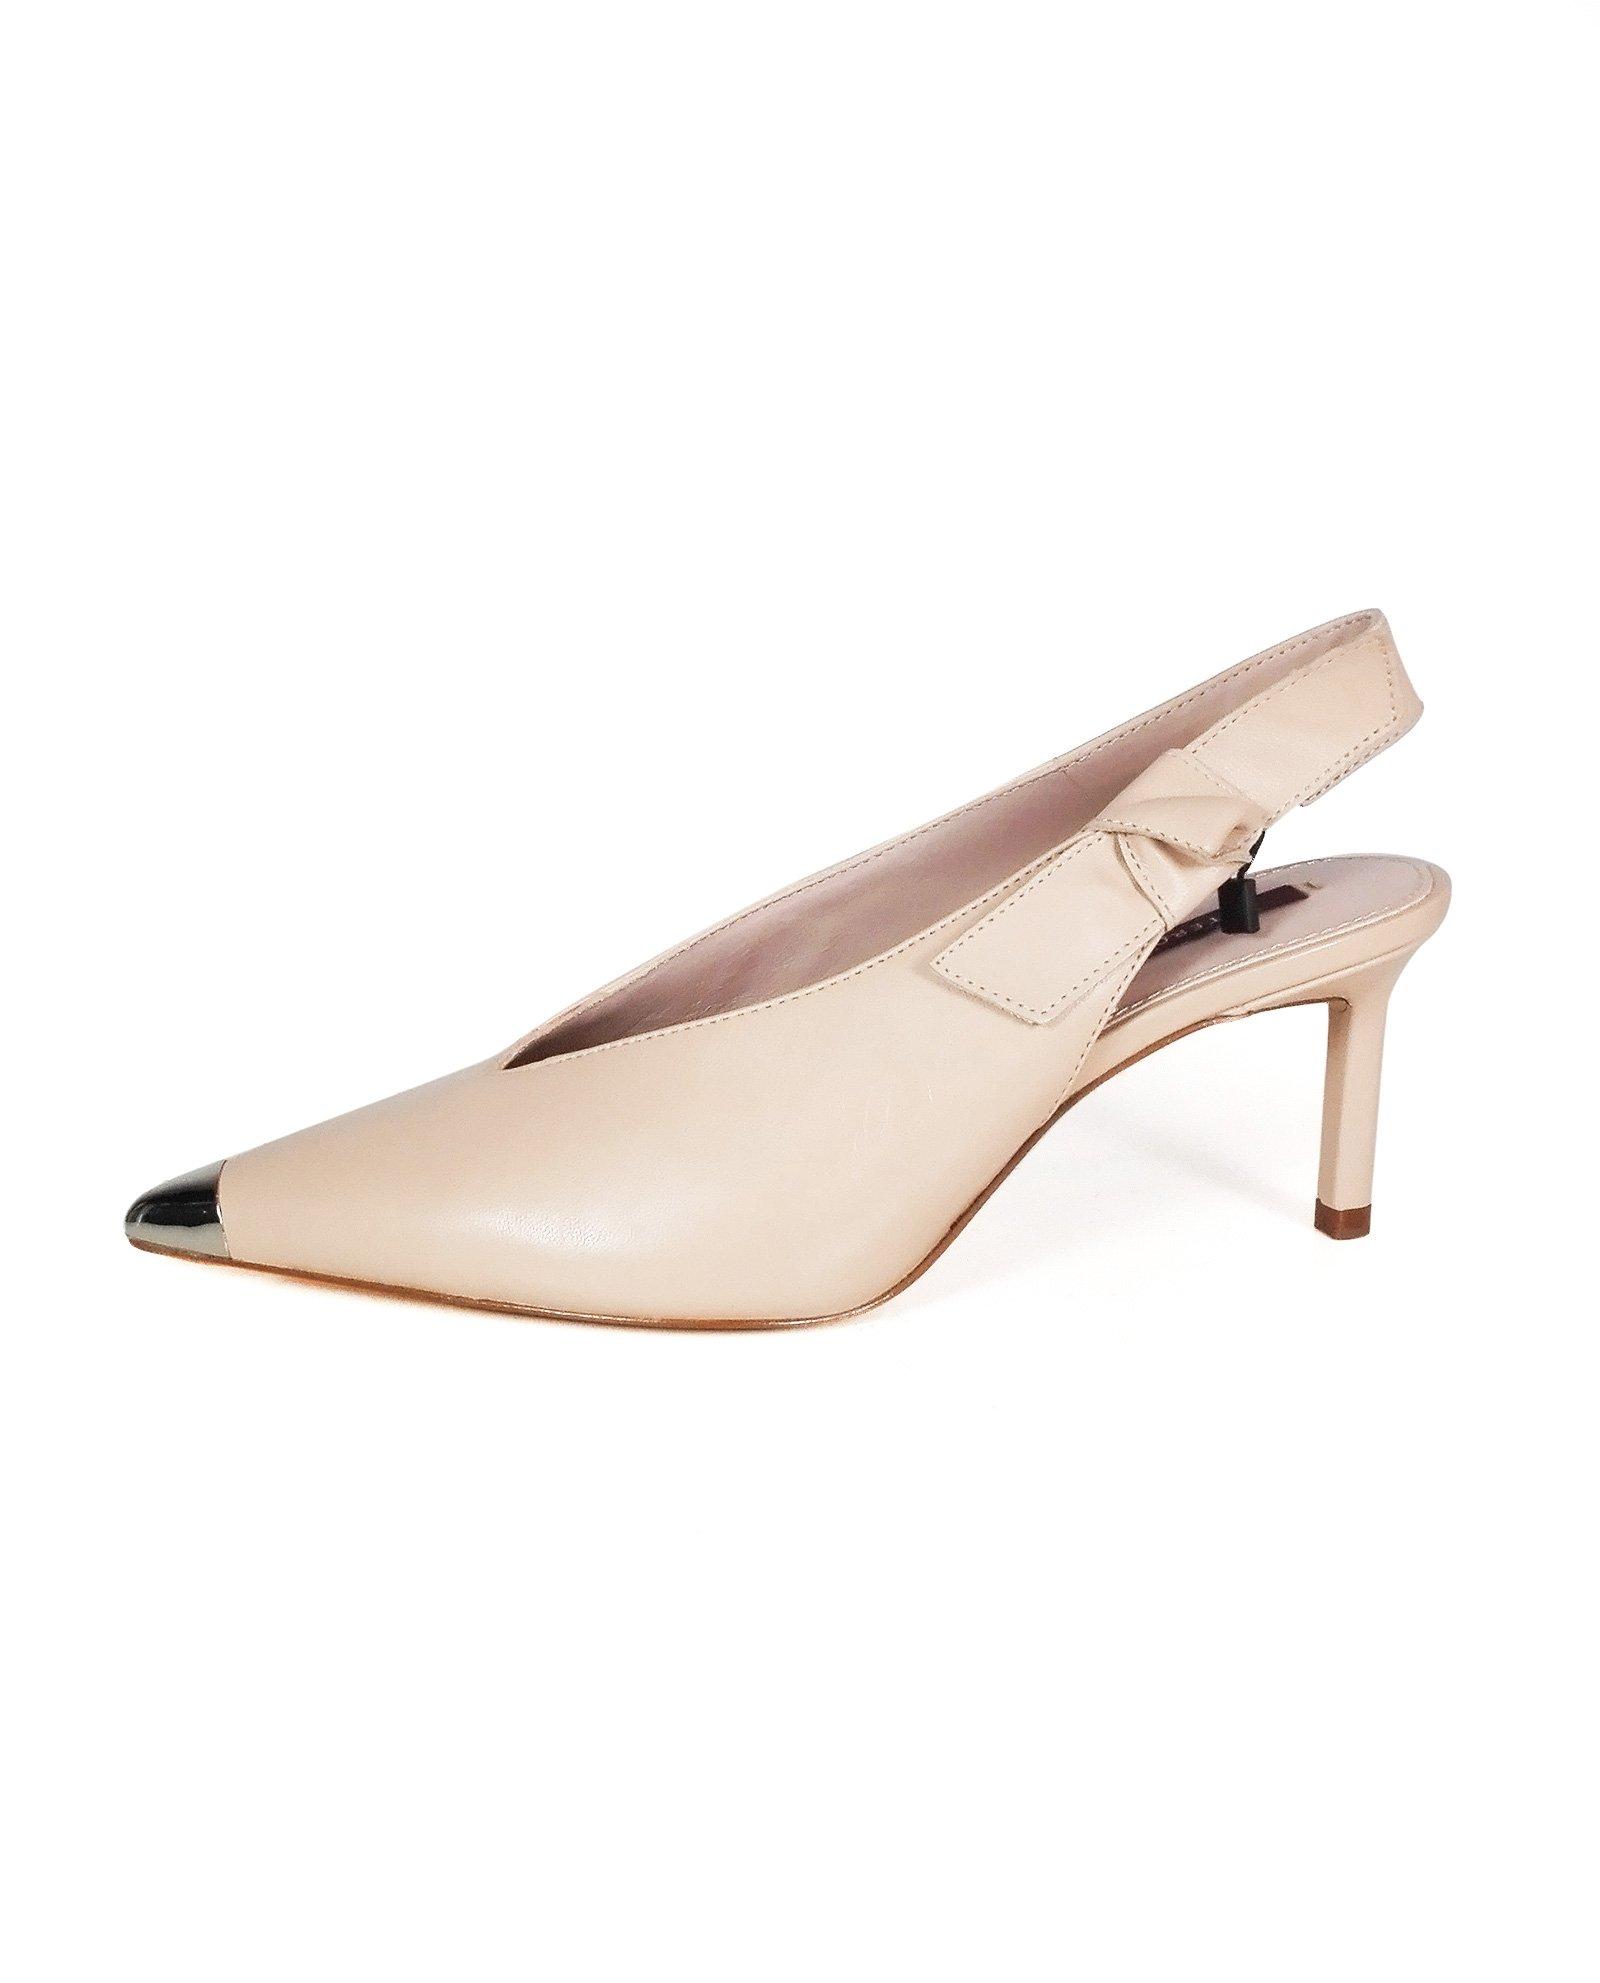 Uterque Women Slingback shoes with metal toe detail 4041/351 (38 EU | 7.5 US | 5 UK)